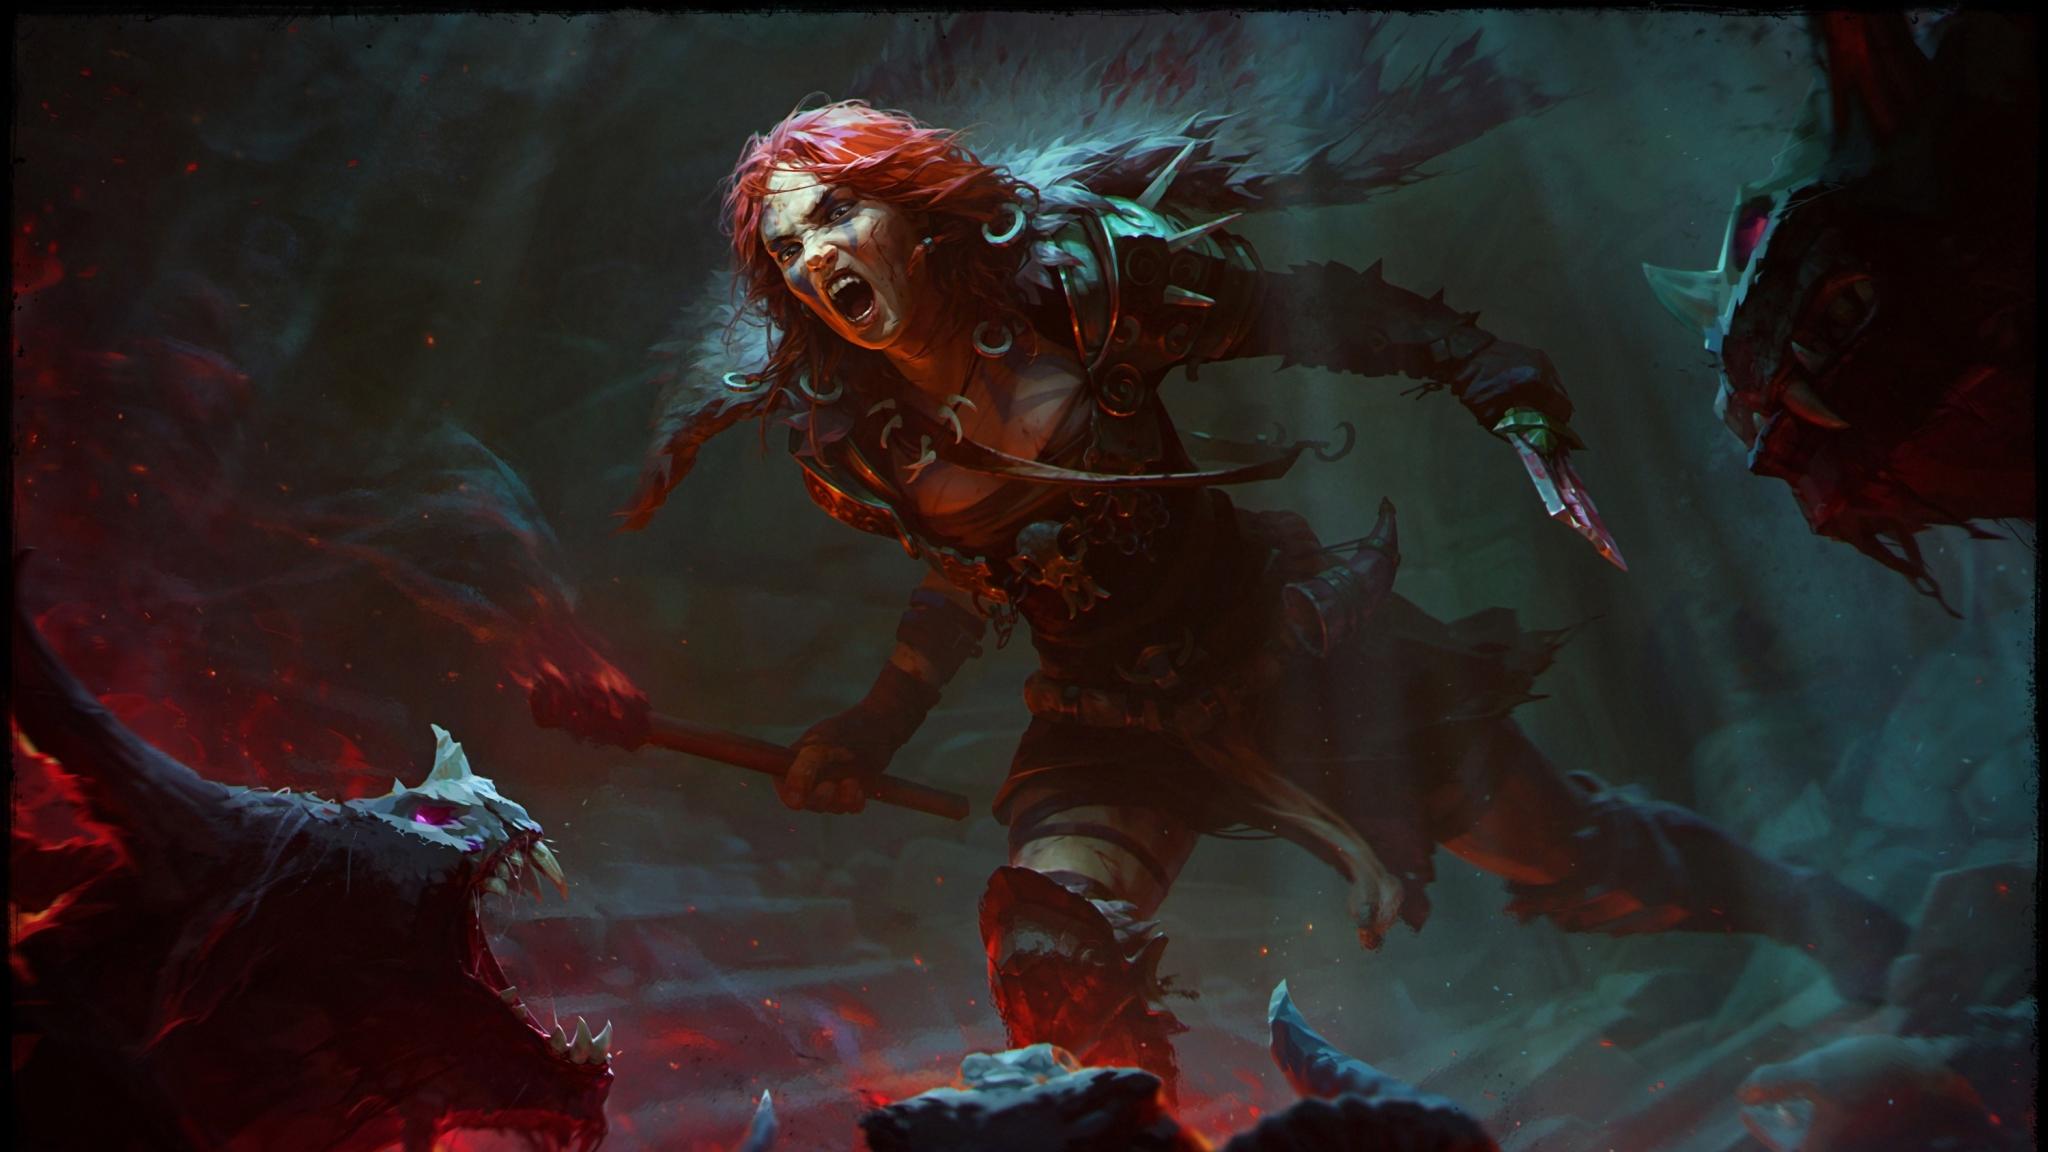 2048x1152 Barbarian Diablo 2048x1152 Resolution Wallpaper